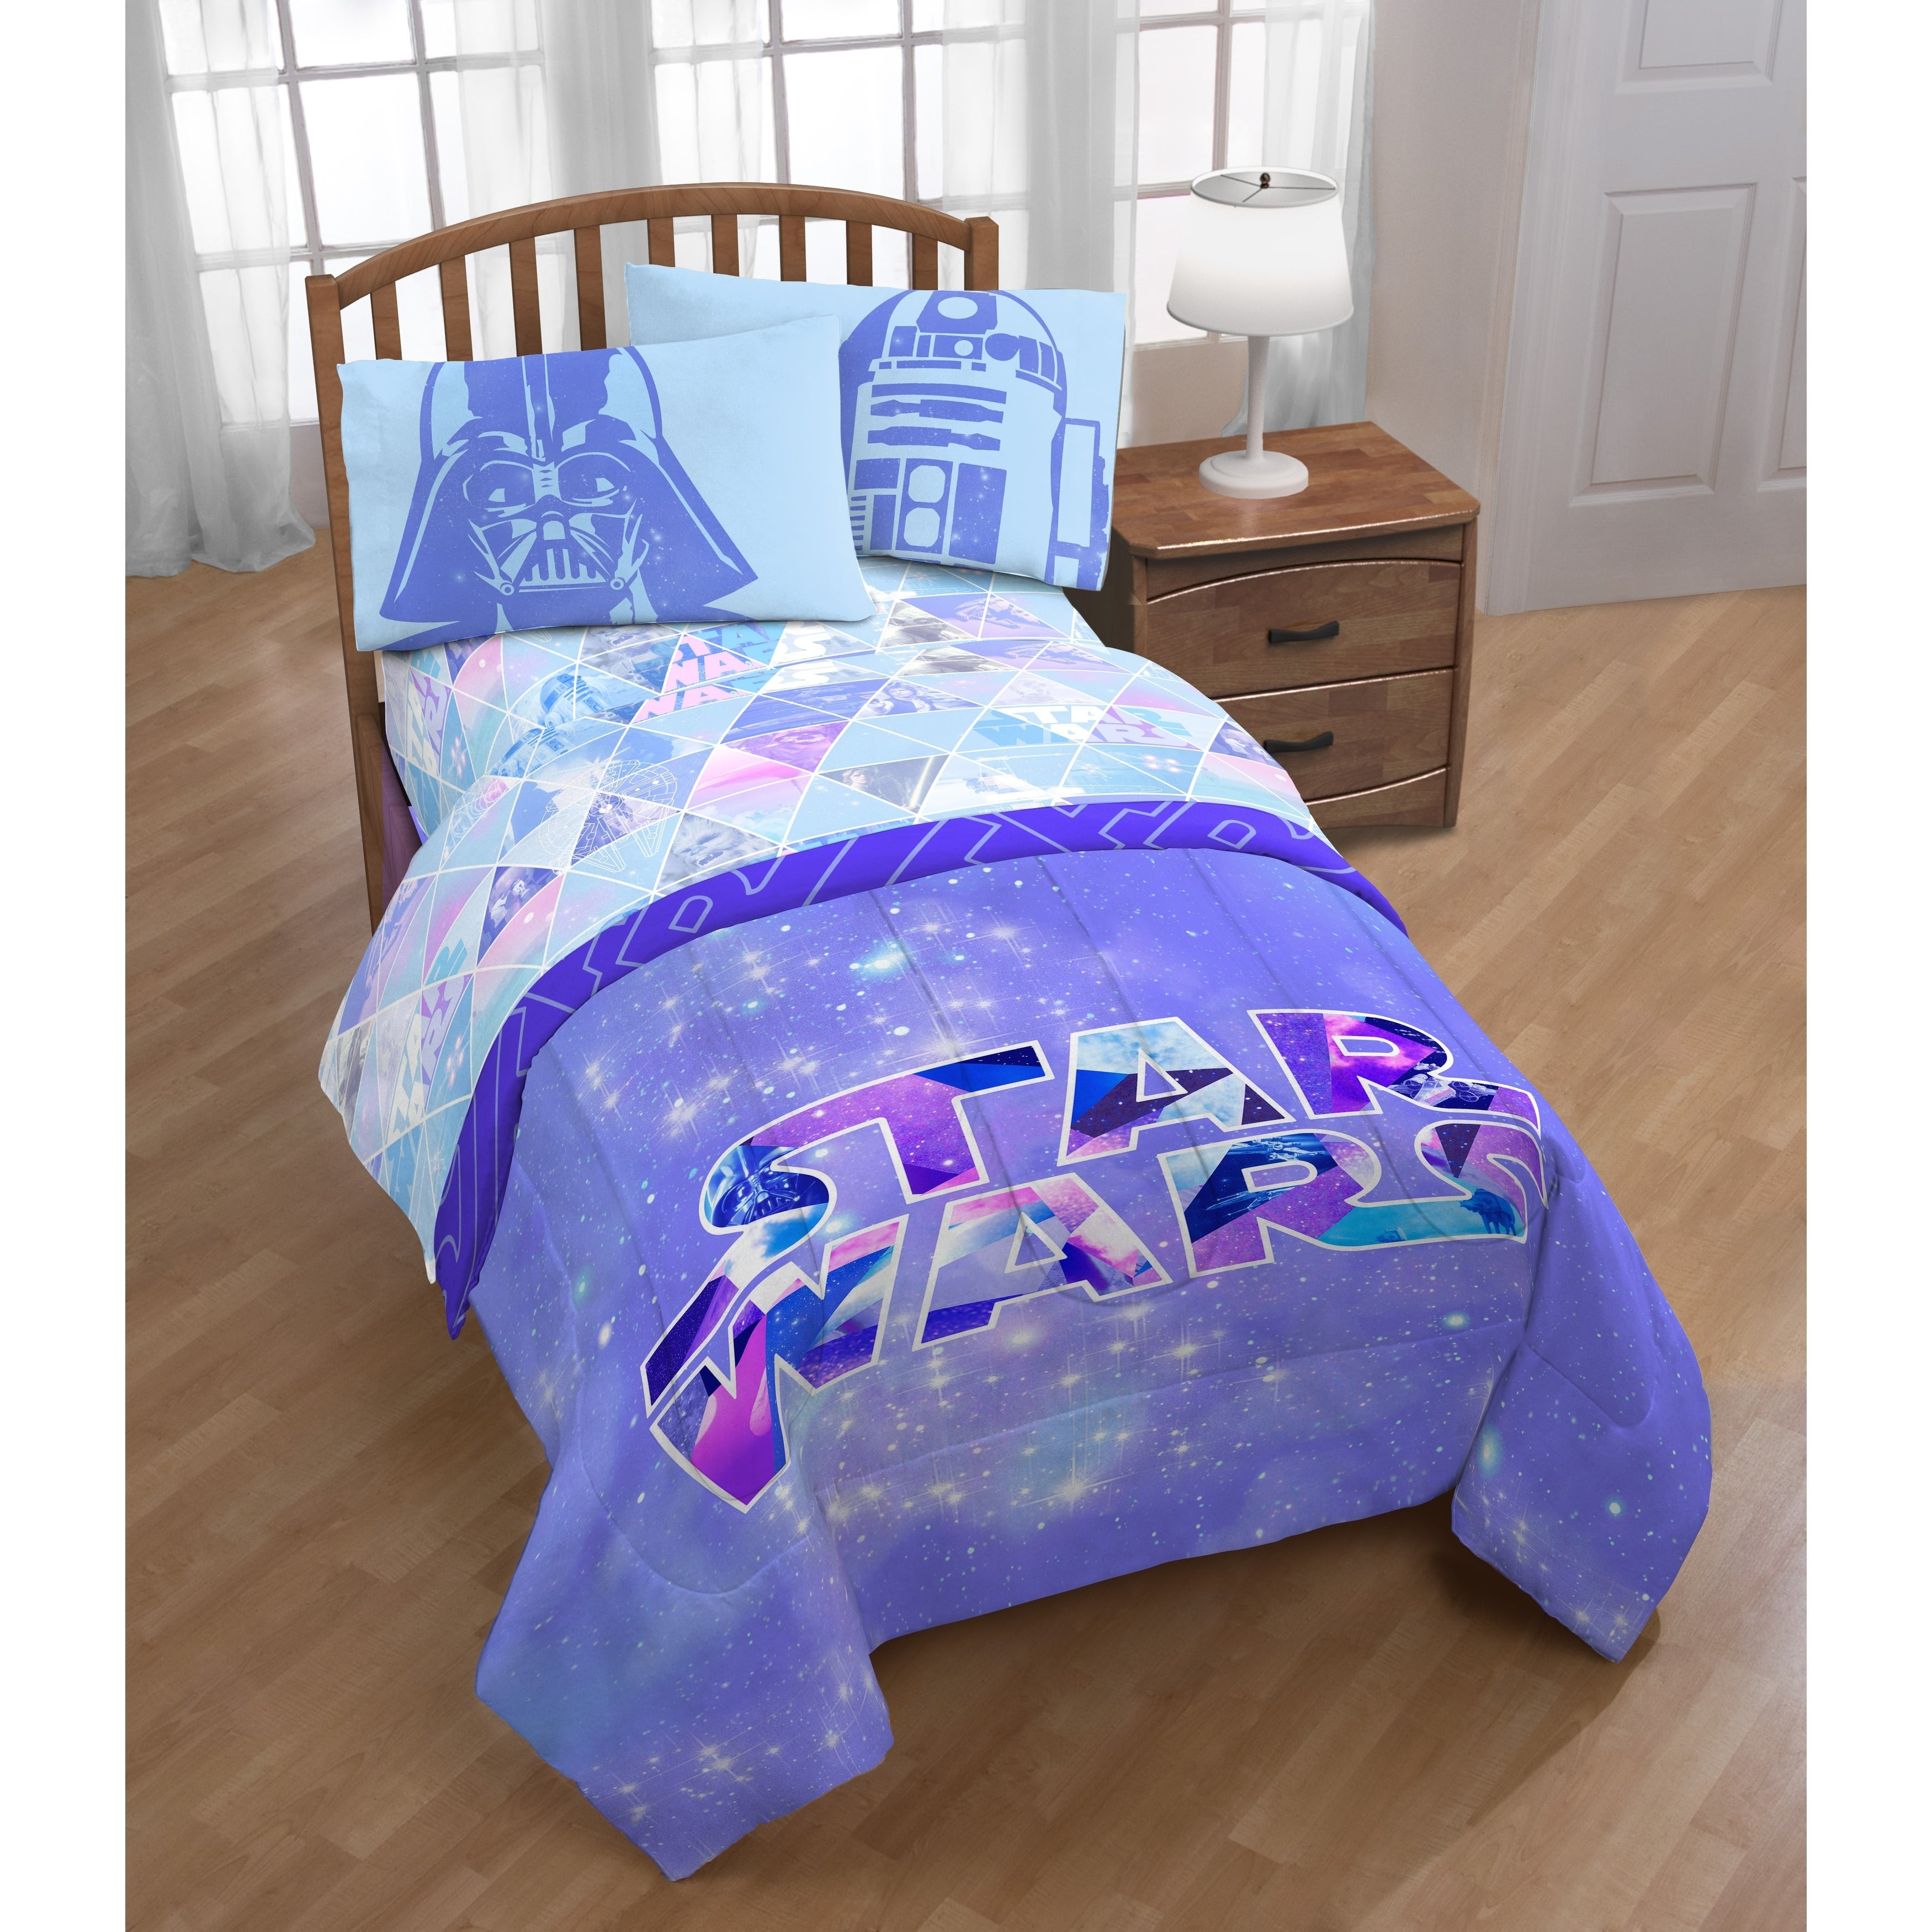 burning hanging celestial hippie bedspread sun mandala pin comforter psychedelic rainbowhandicraft tapestry art sleep wall